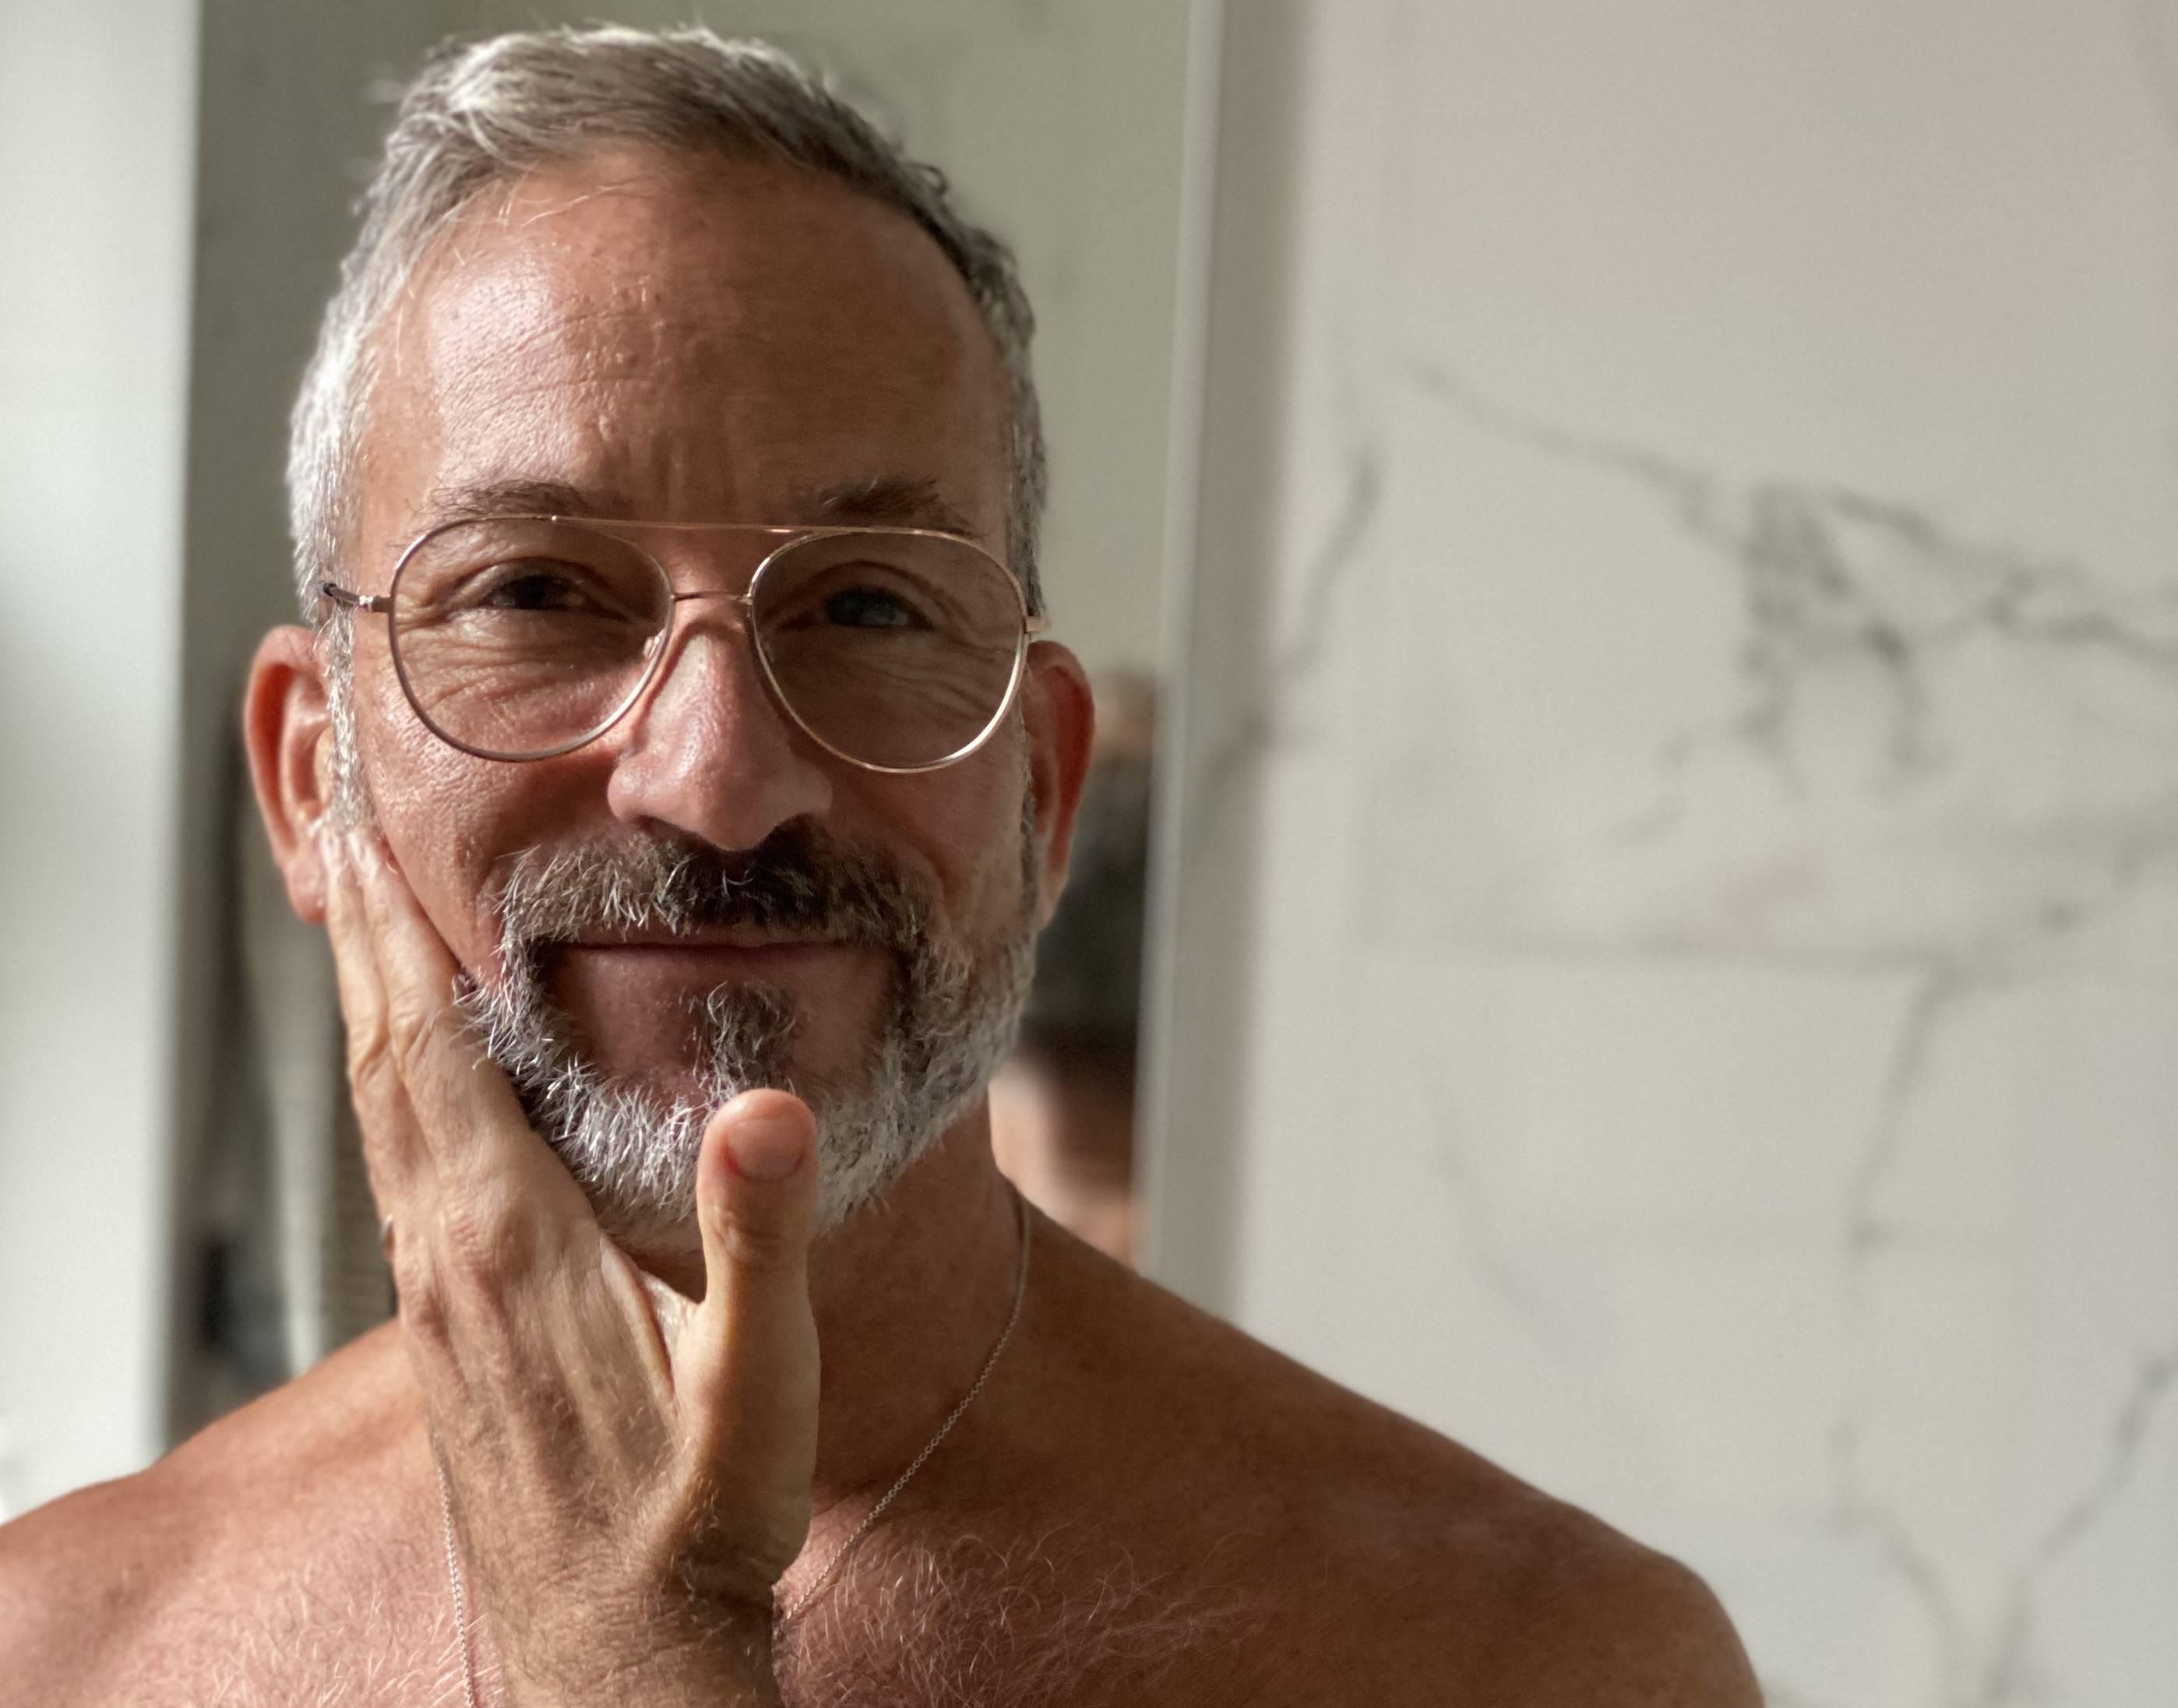 Davines mens beard self care Pasta & Love shaving set